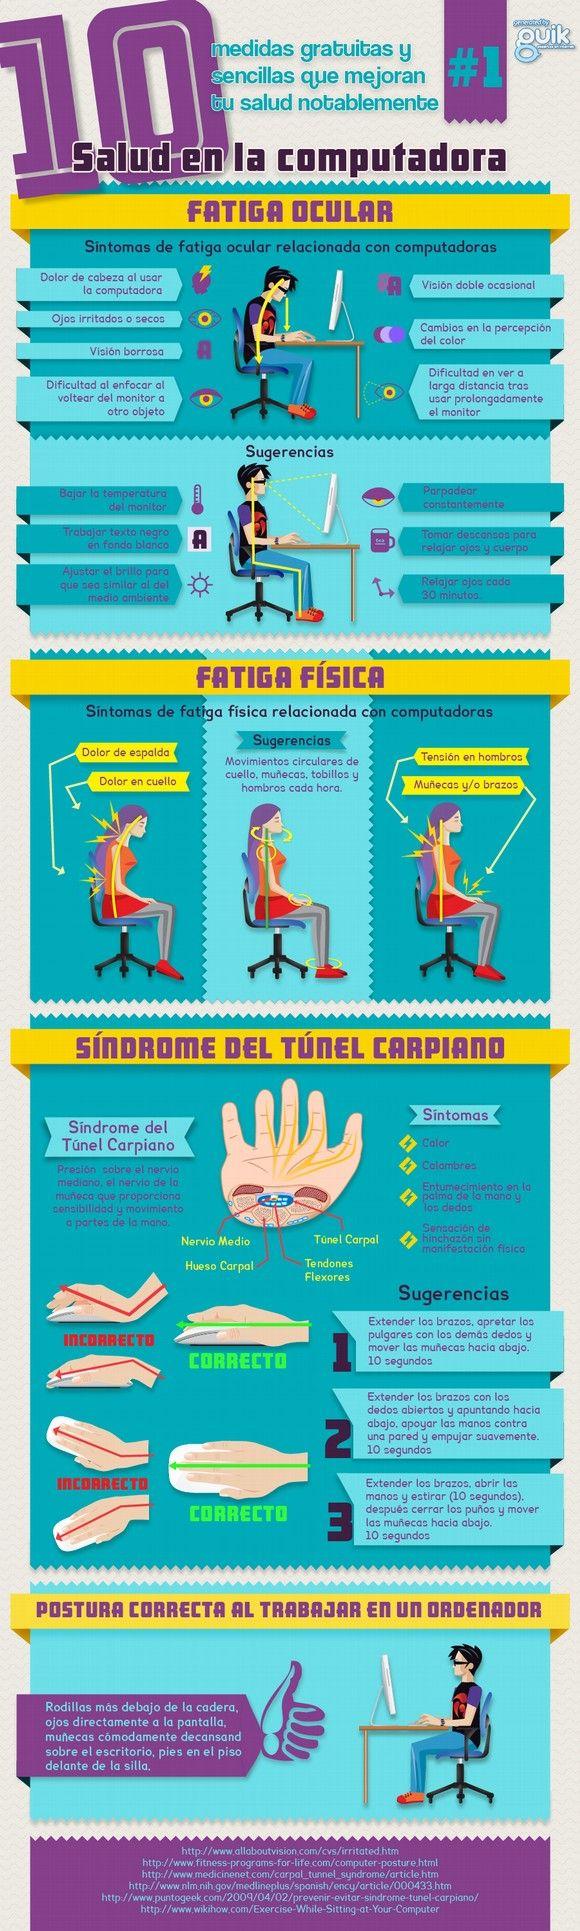 10 medidas para mejorar tu salud al ordenador #infografia #infographic #health